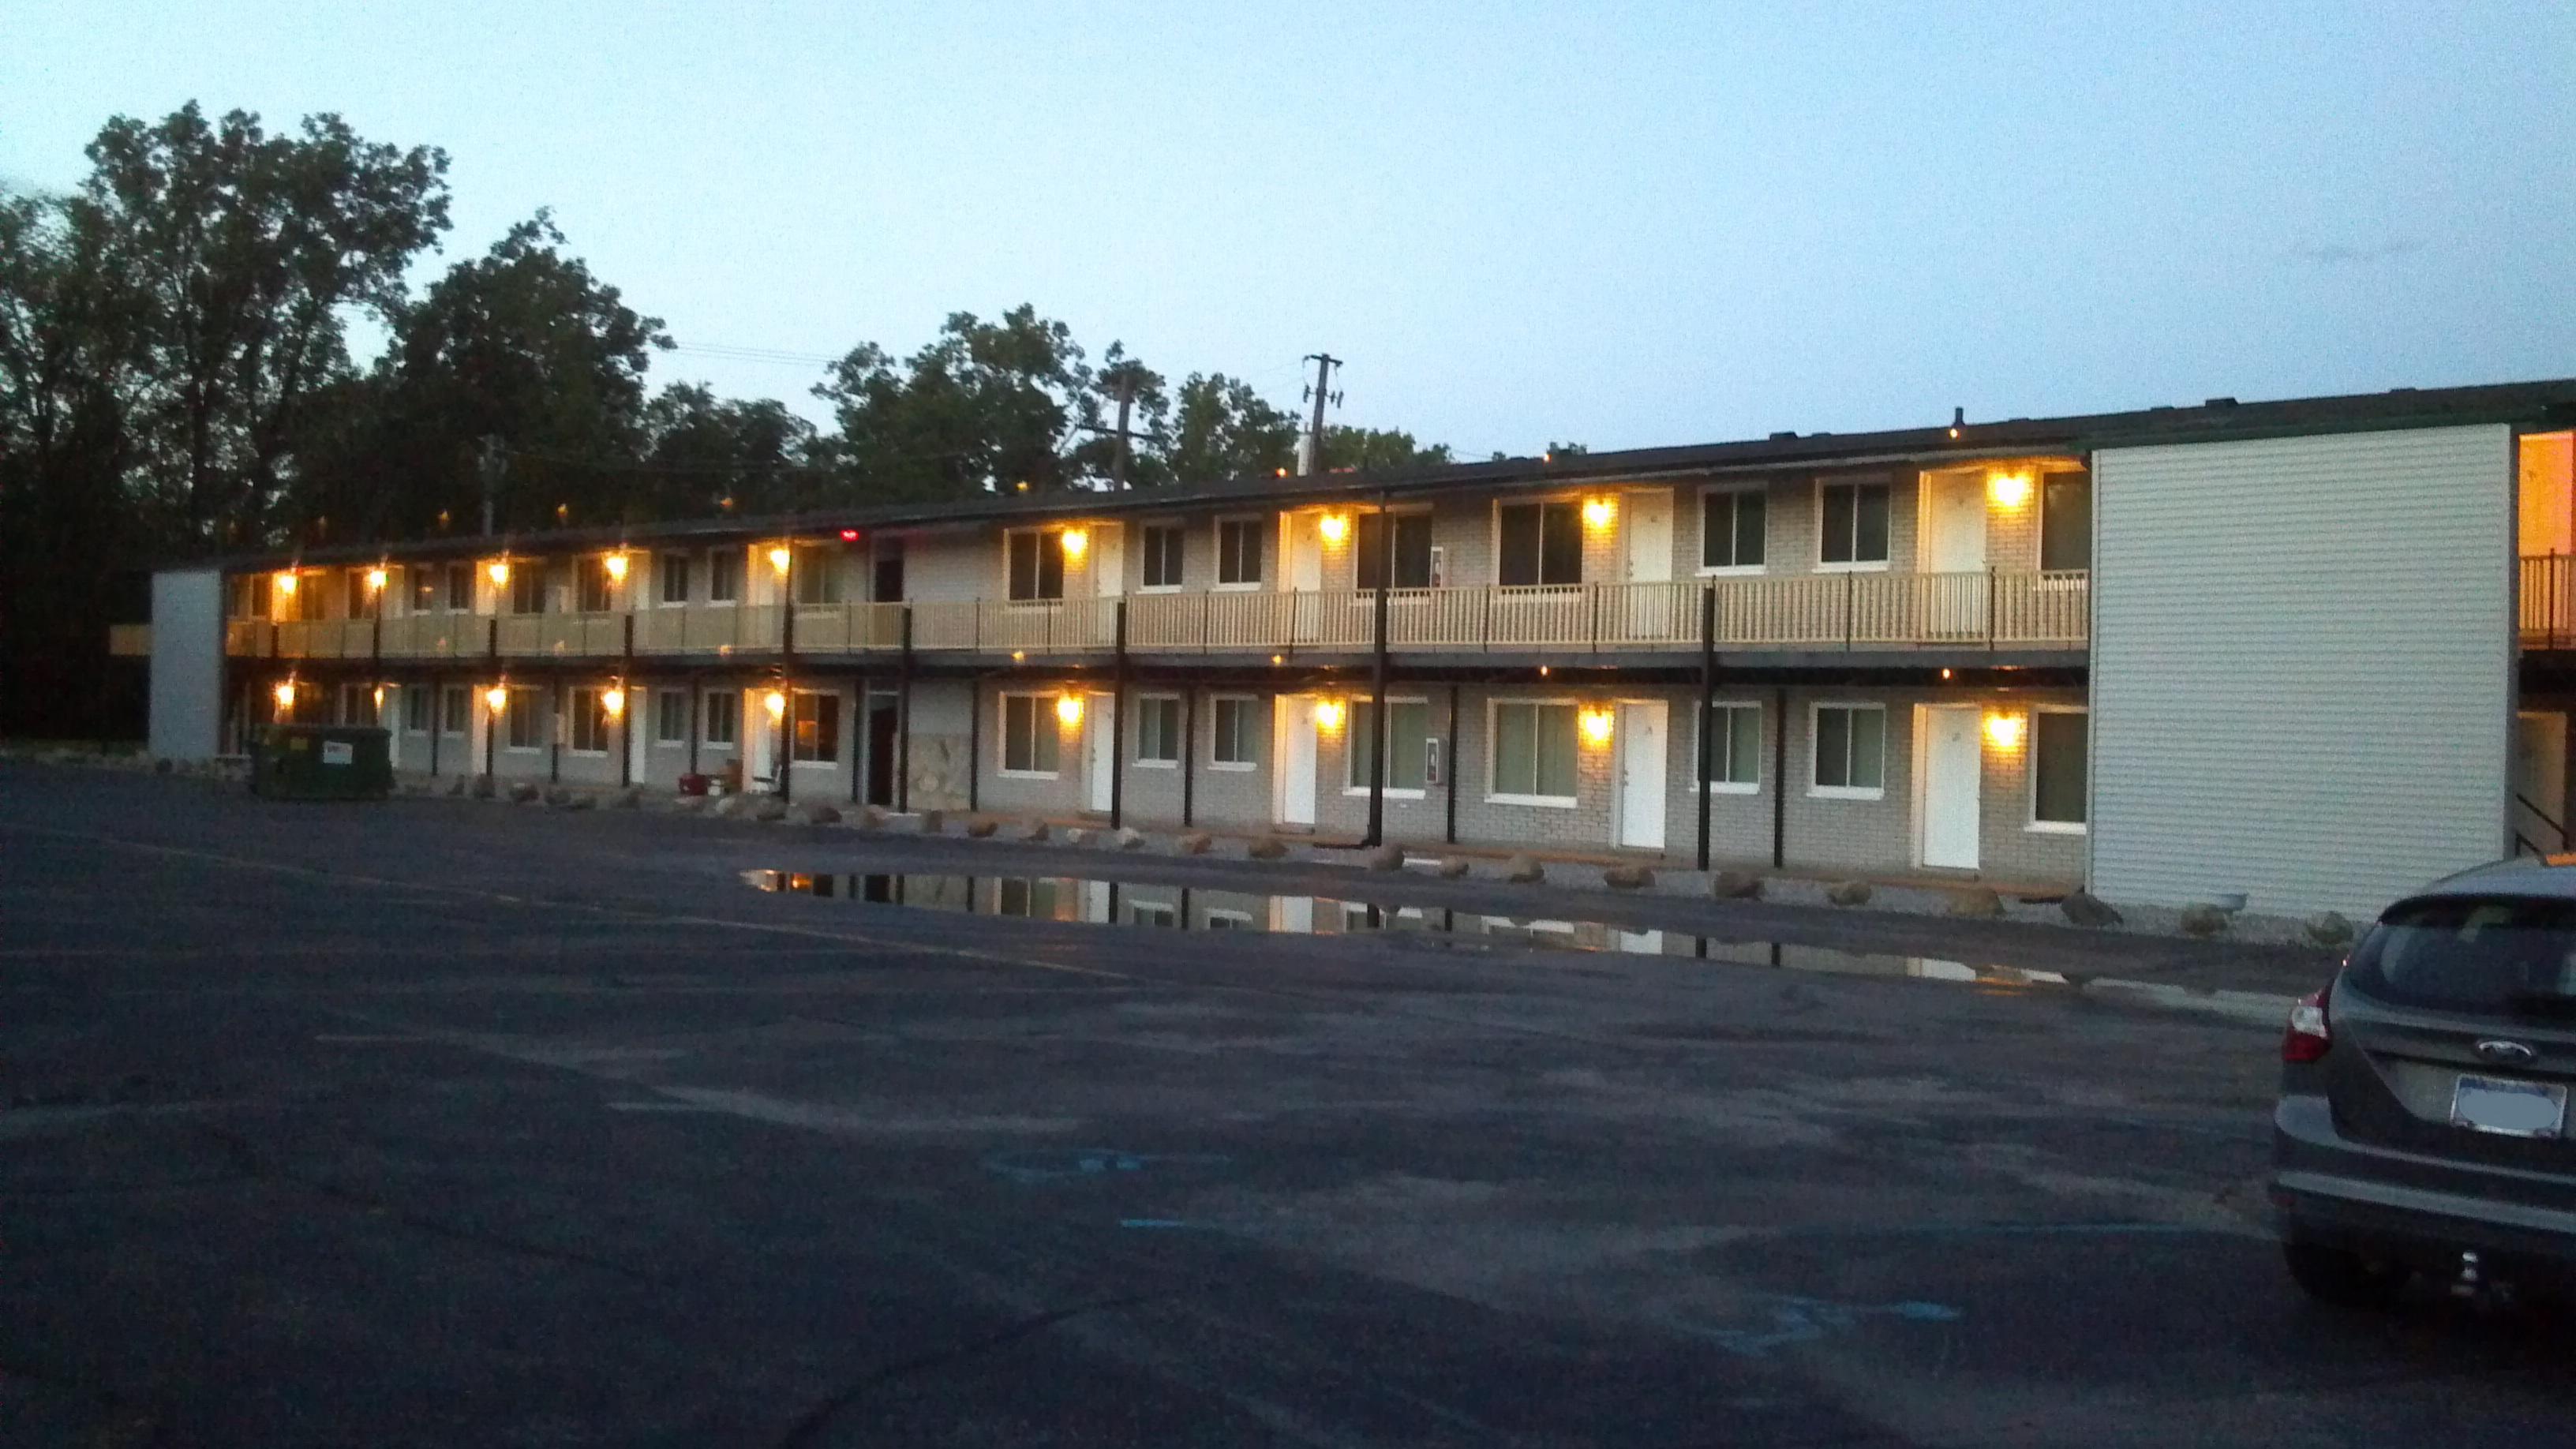 Bad Credit Rentals Renting With Bad Credit 100 House Rentals Okc Oakwood Homes Of Oklahoma City